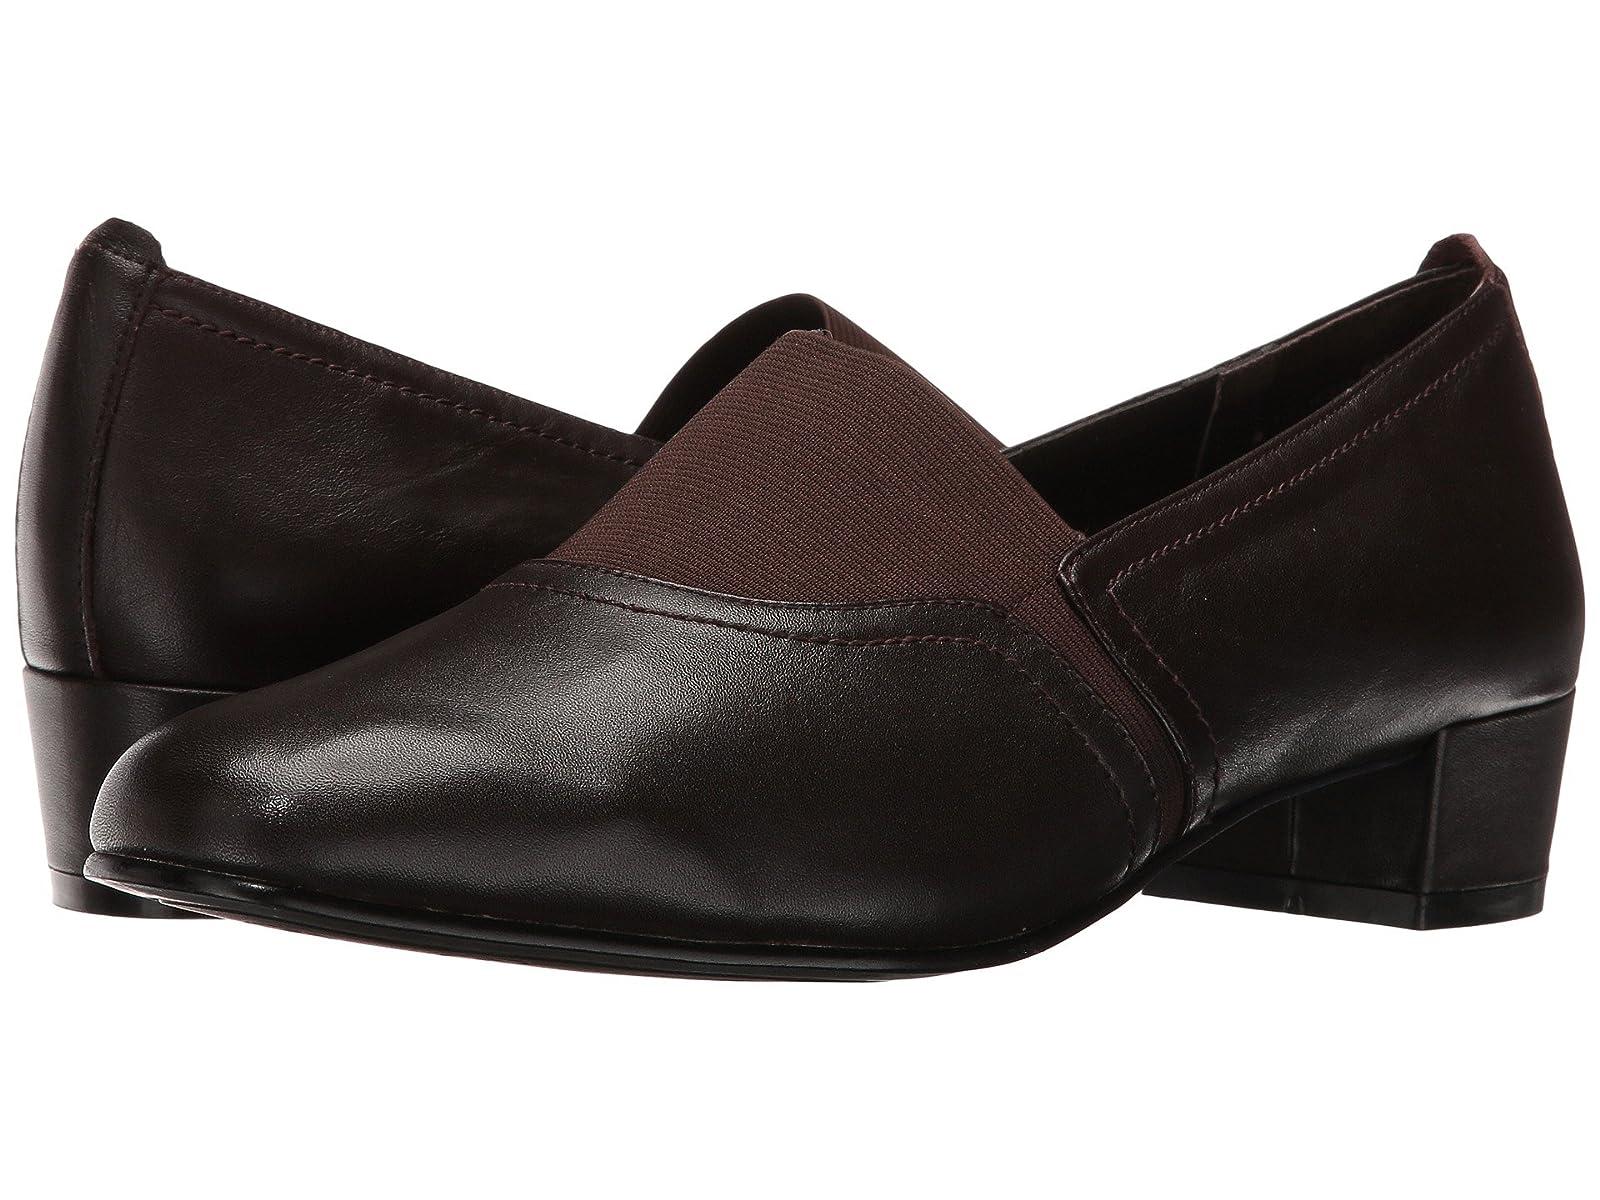 David Tate GiannaCheap and distinctive eye-catching shoes